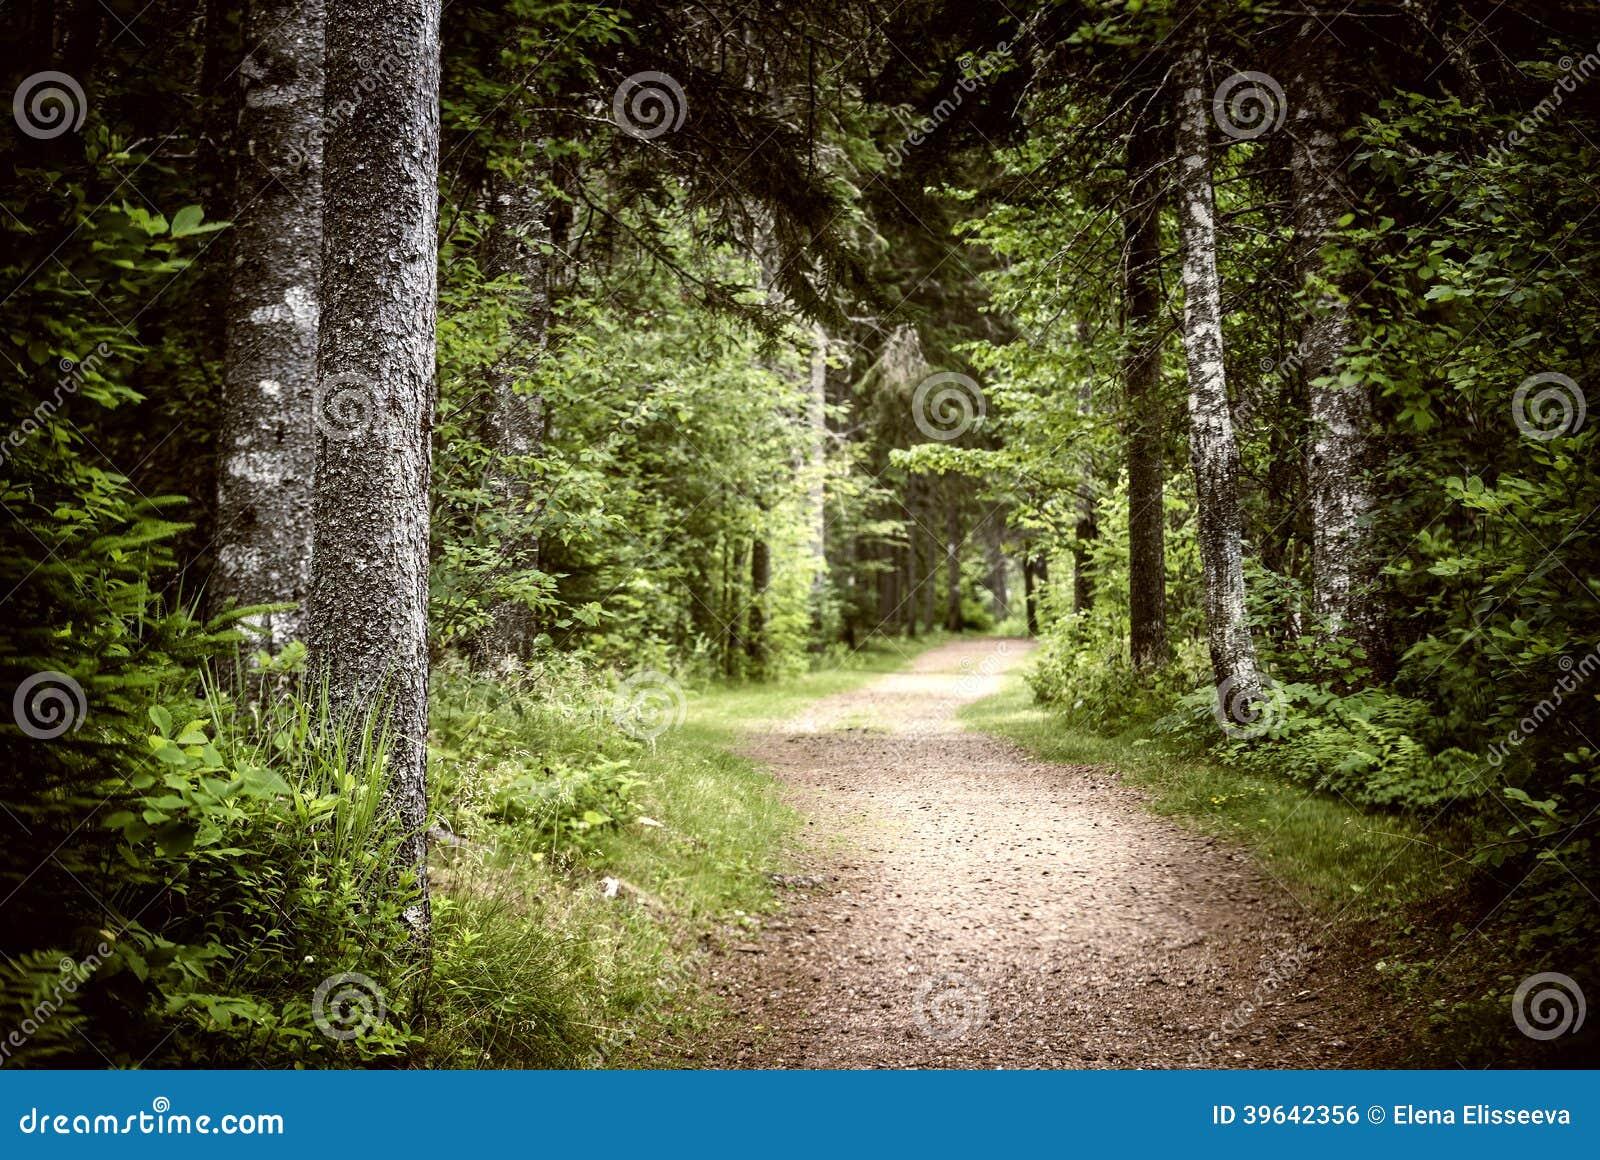 Path in dark moody forest